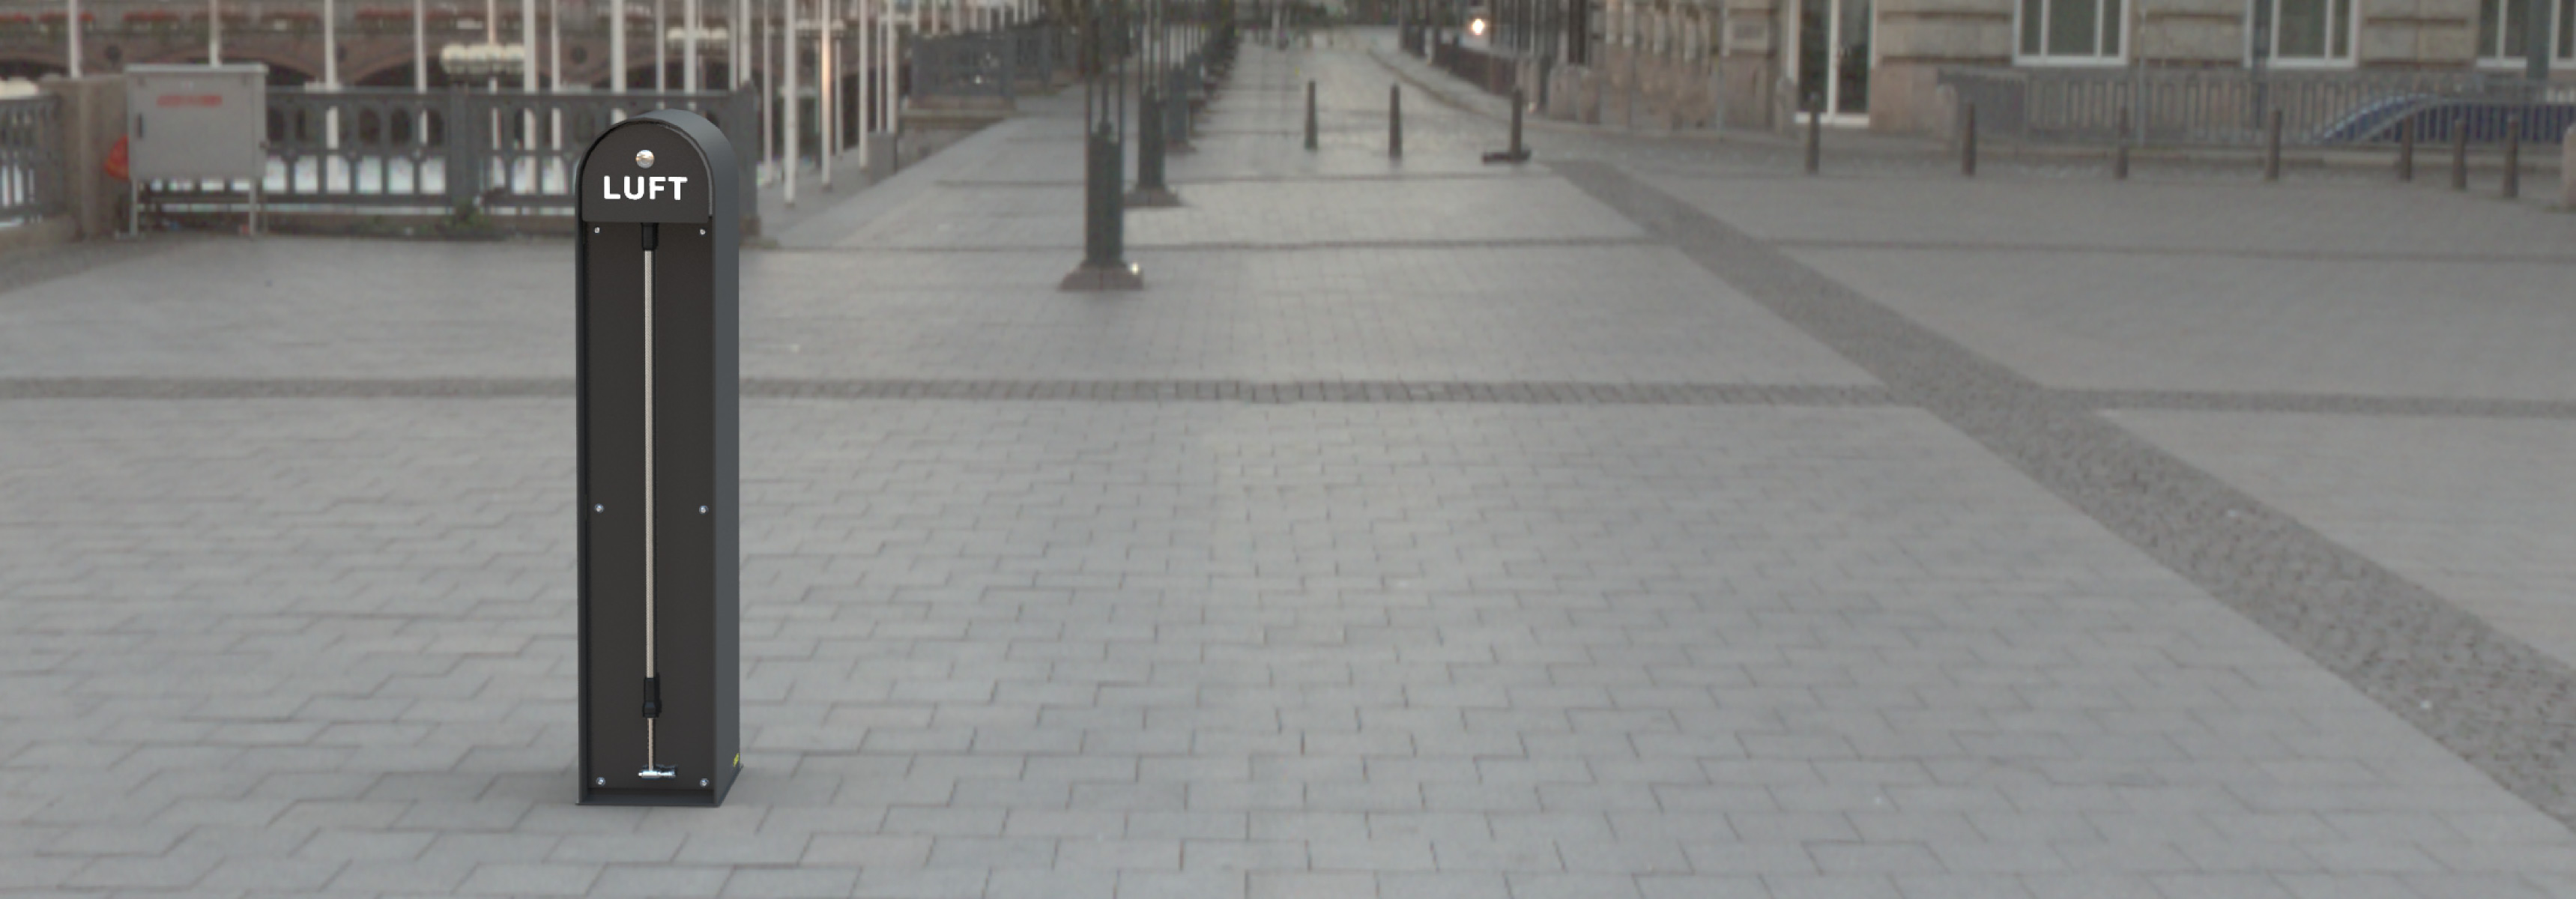 Cyklos WAVE air automatisk cykelpump för offentlig utemiljö